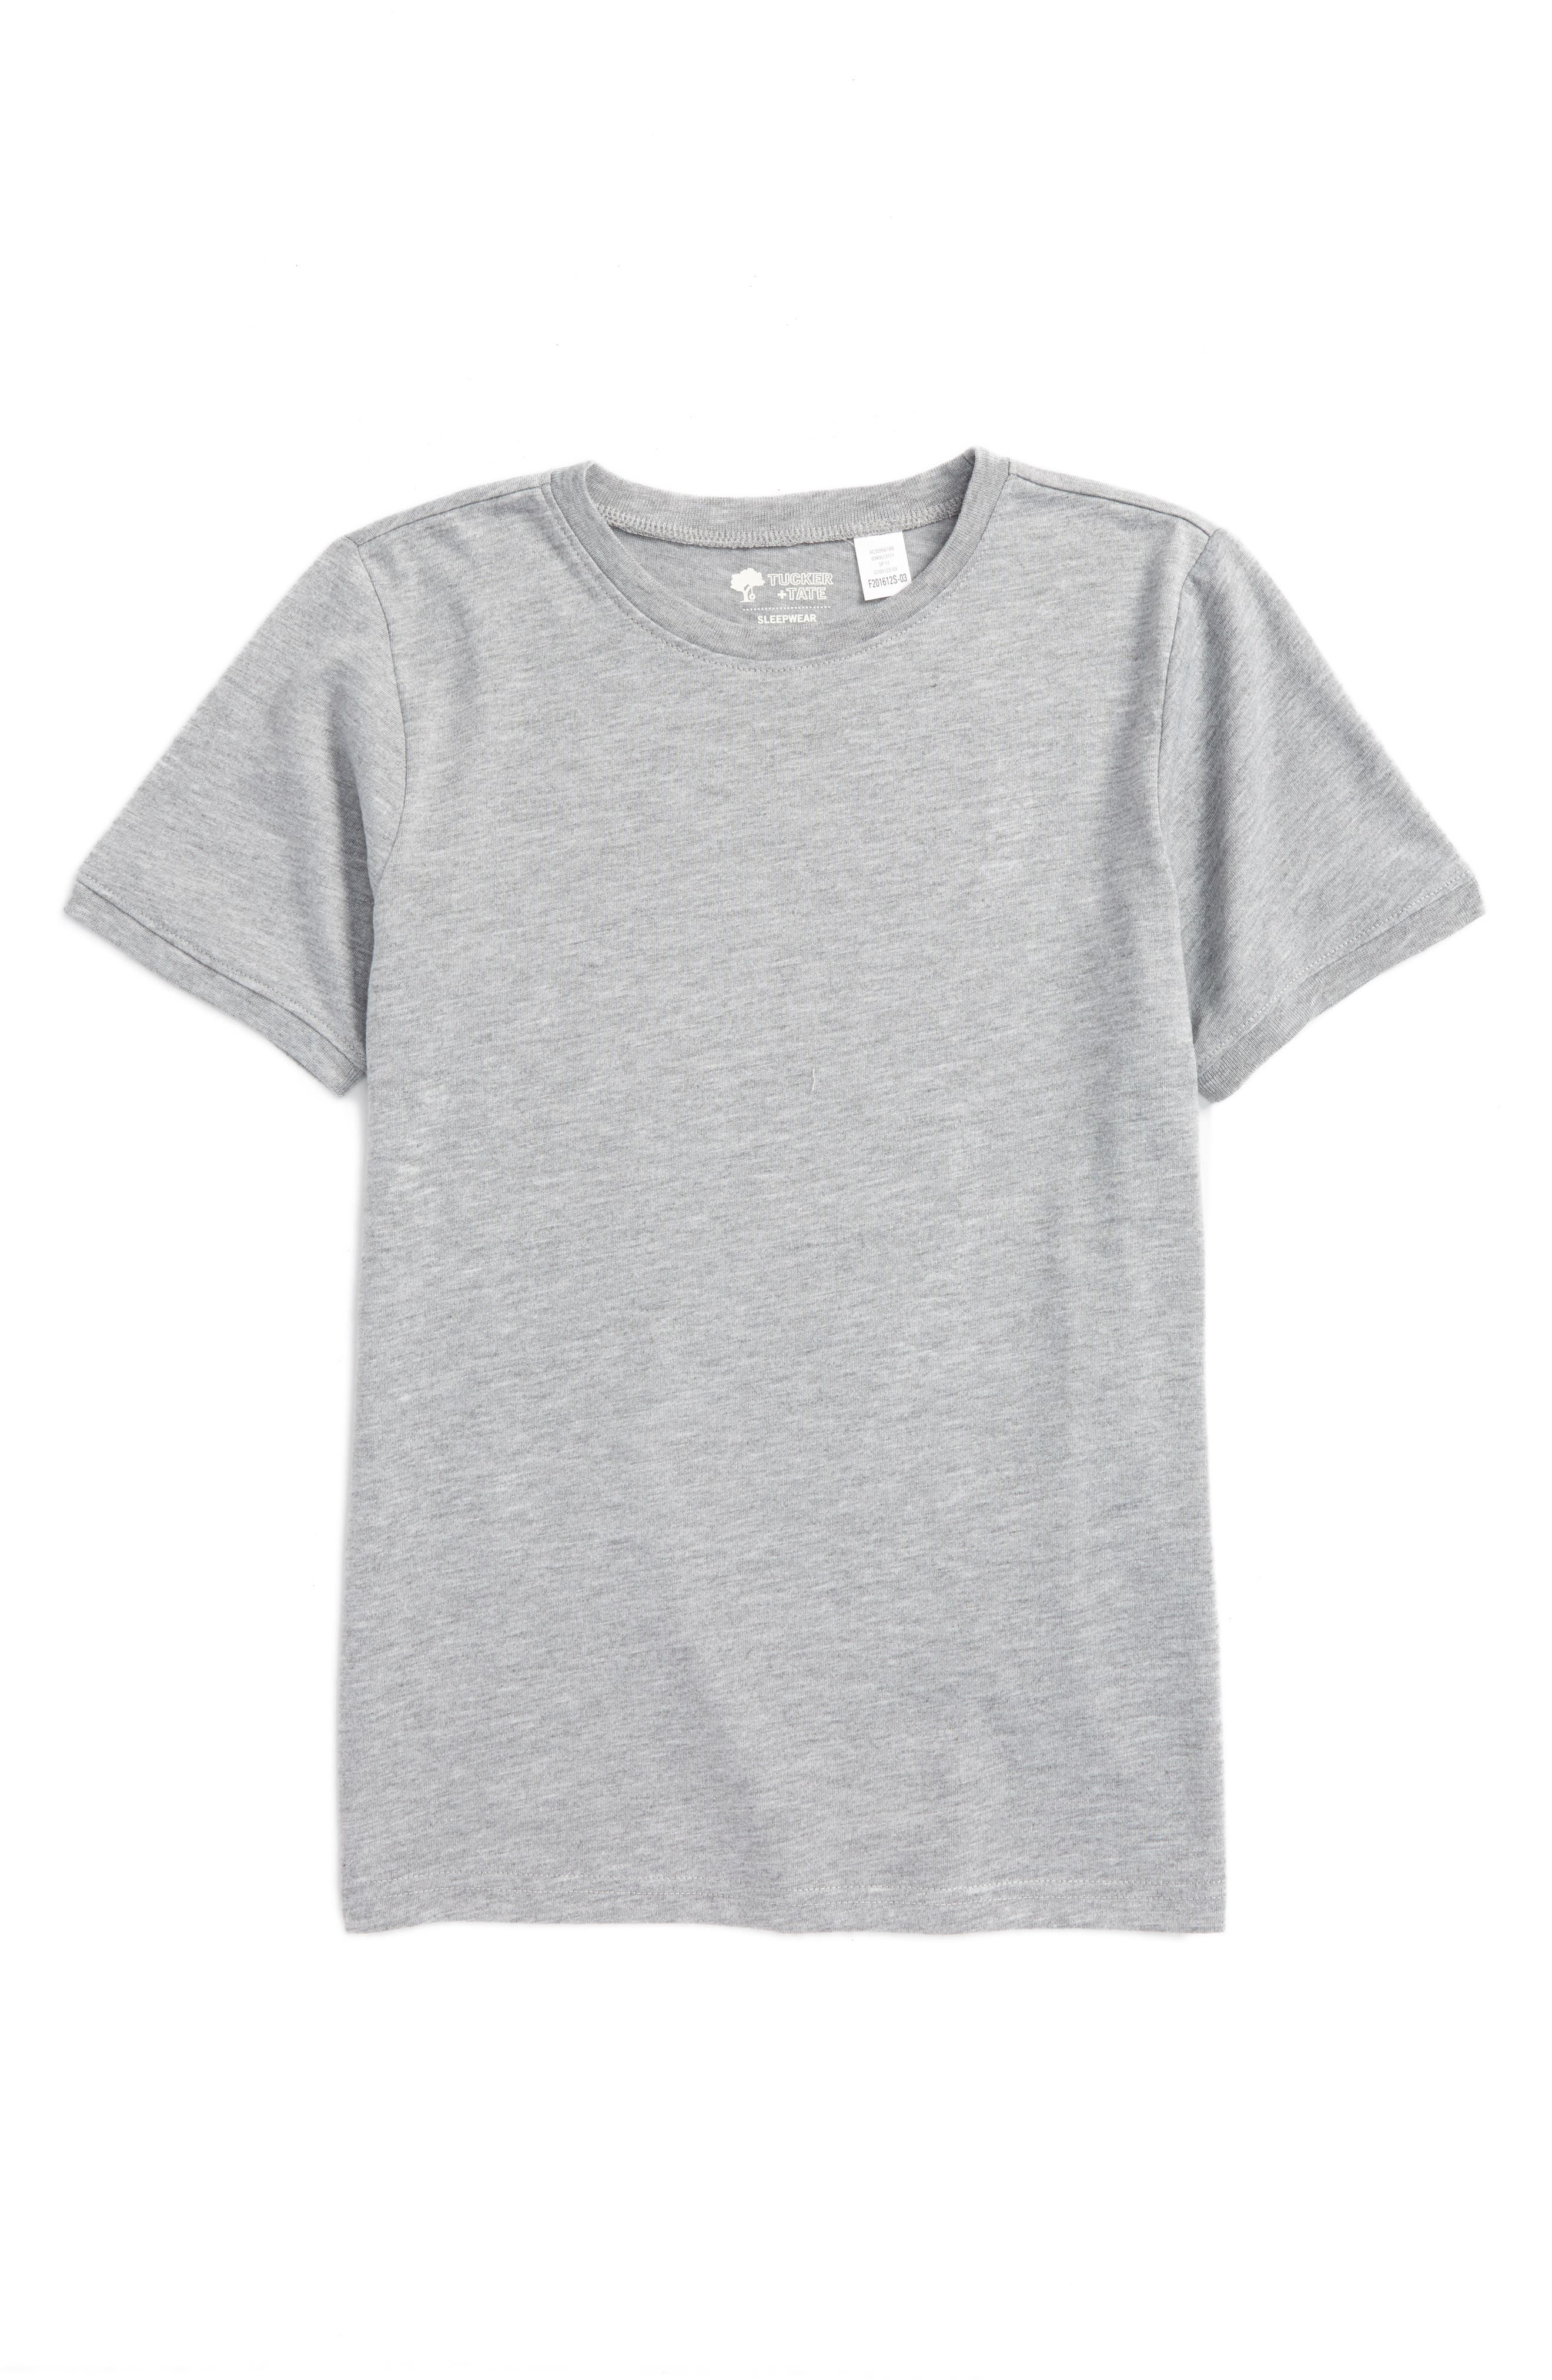 Sleep T-Shirt,                             Main thumbnail 1, color,                             030